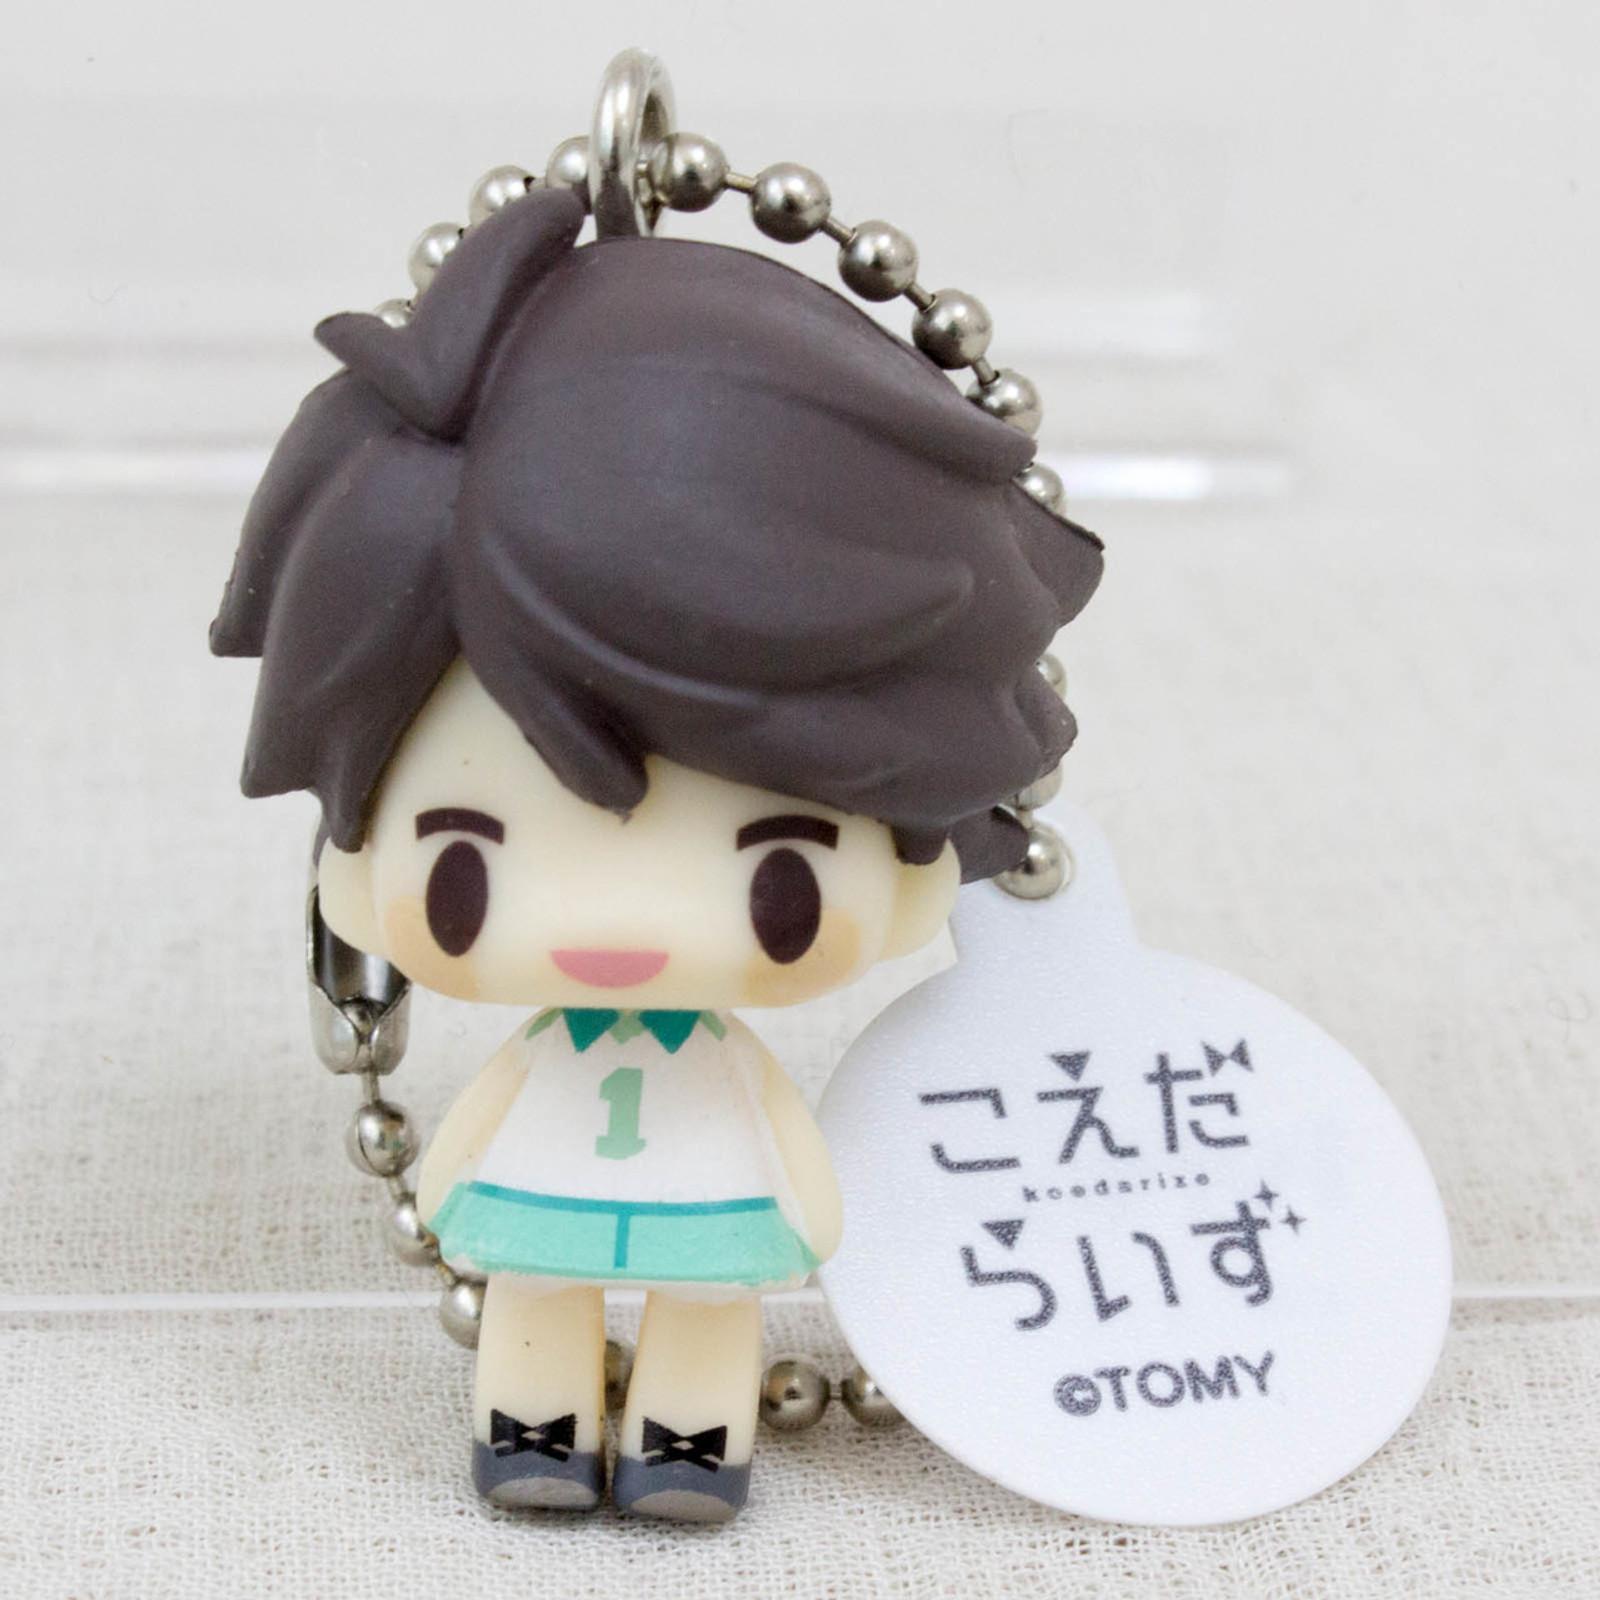 Haikyu!! Koedarize Mascot Figure Strap Toru Oikawa Ver. Takara JAPAN ANIME